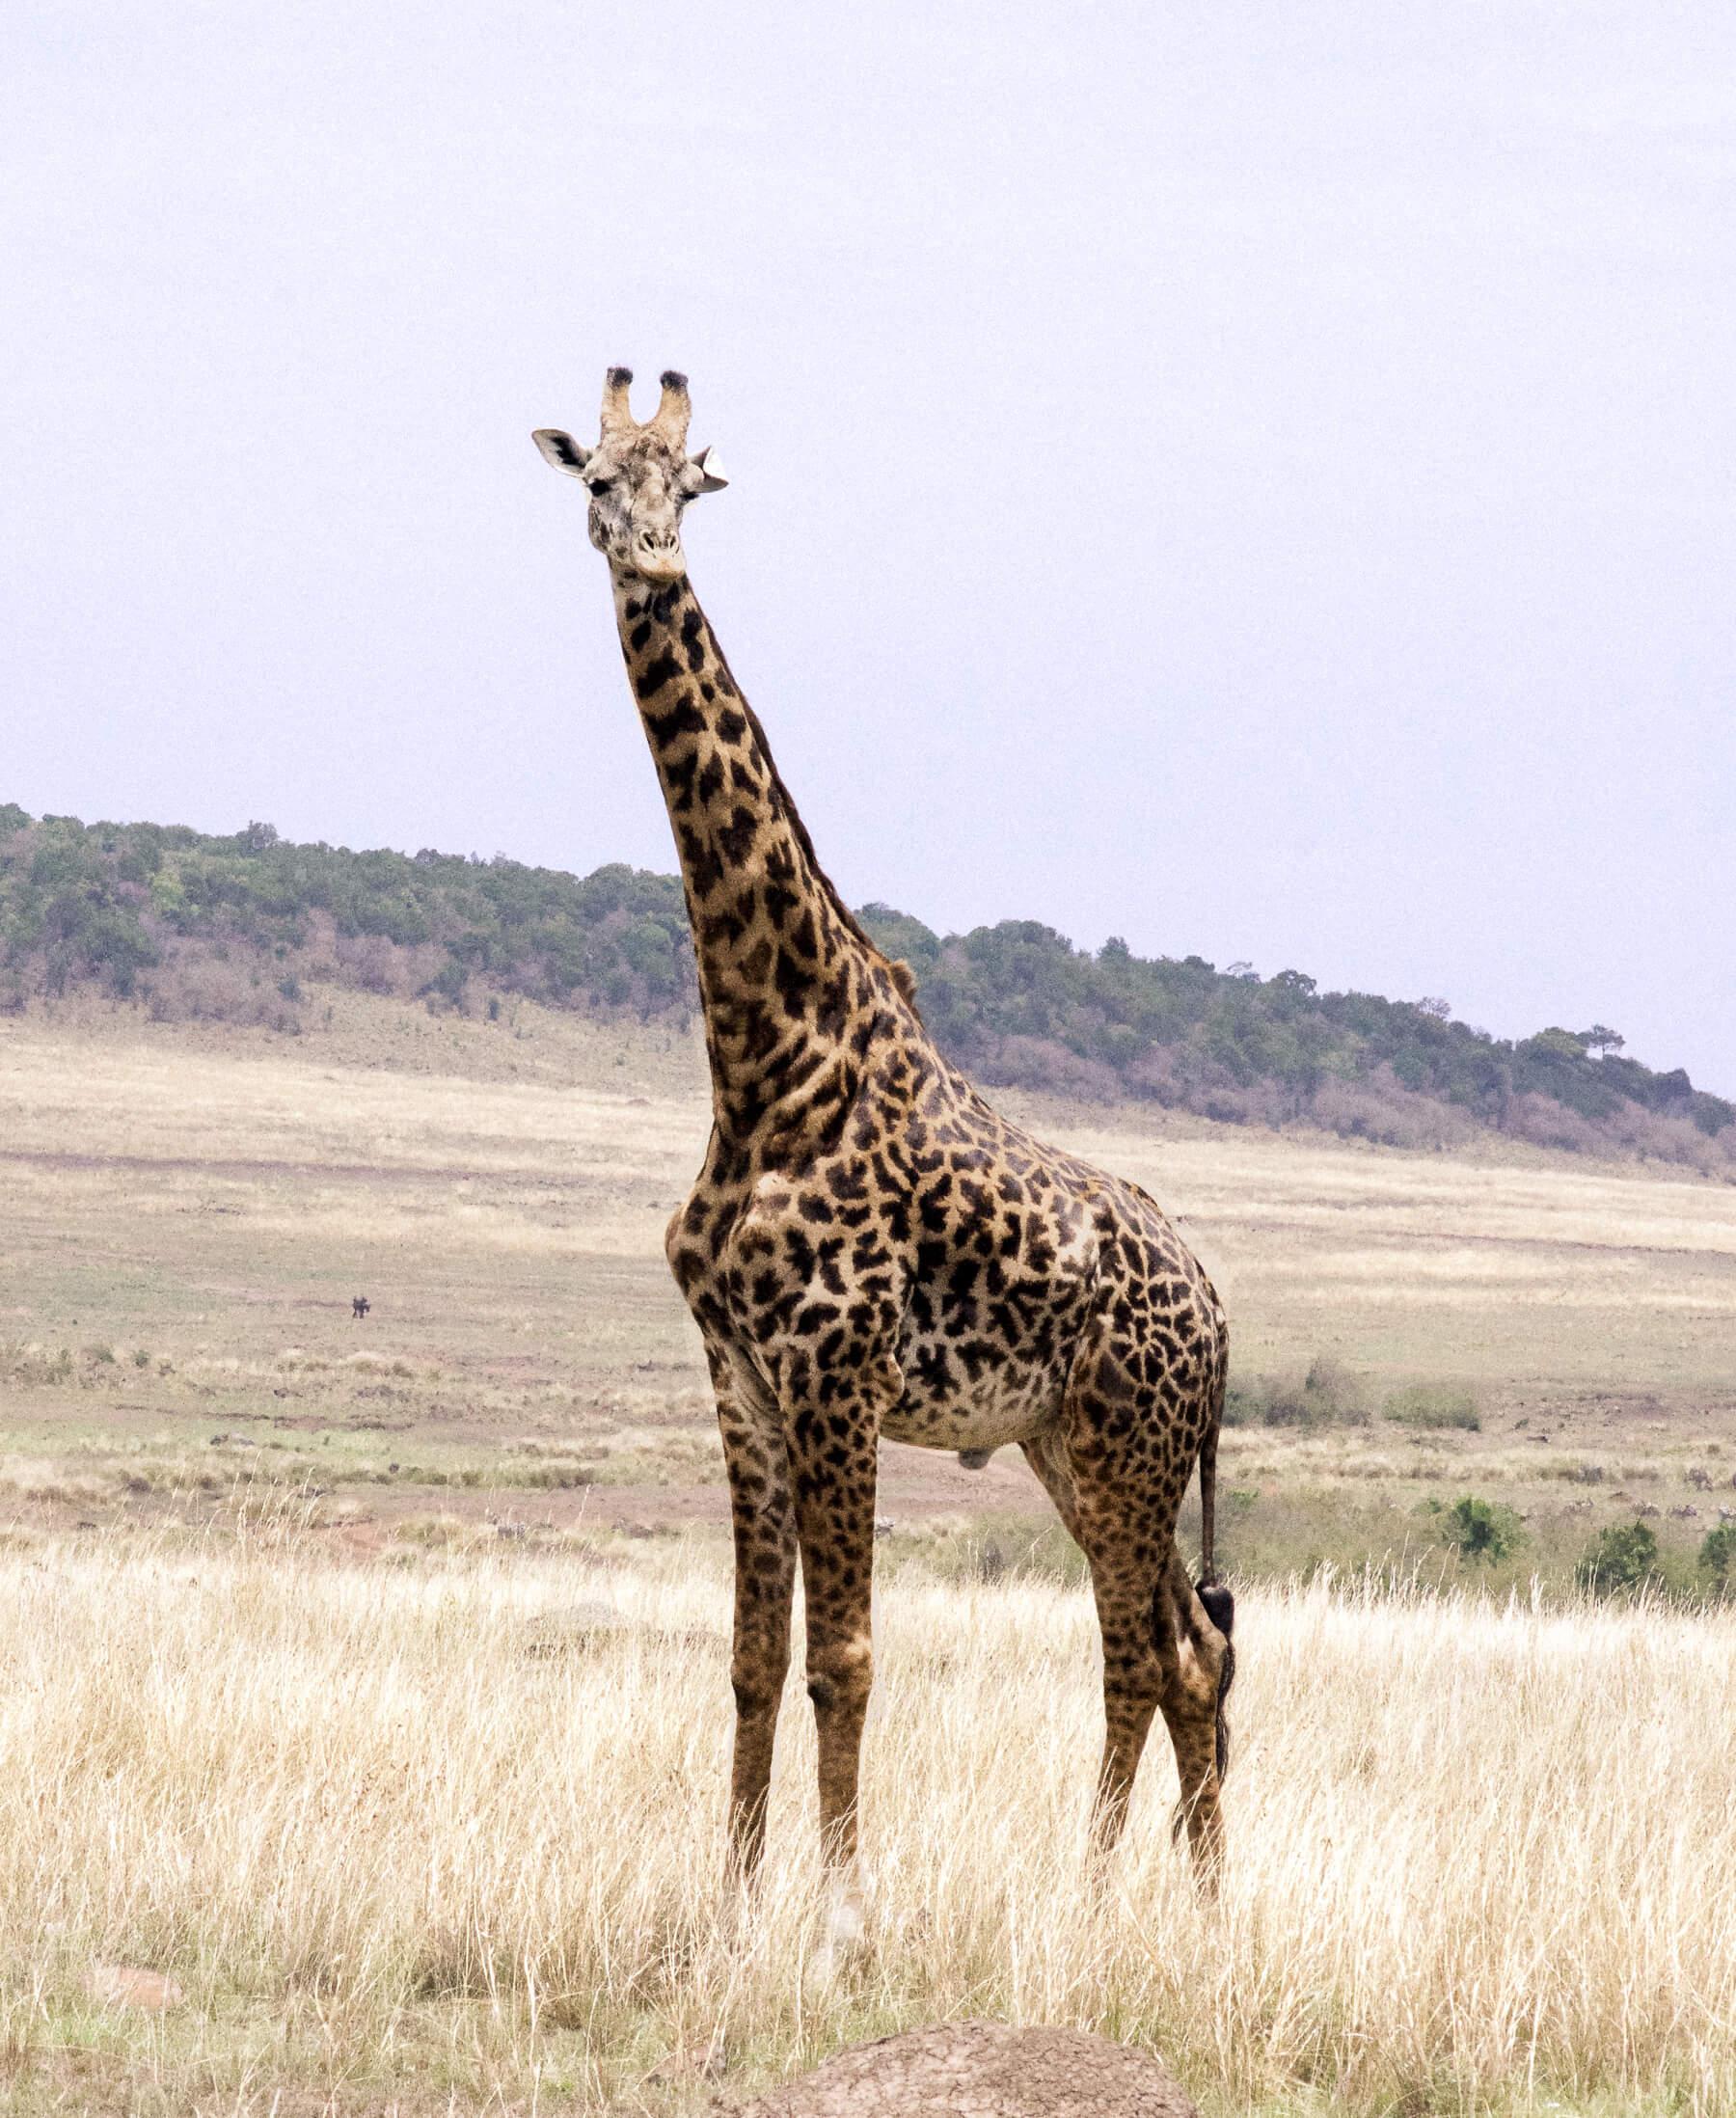 A male Masai Giraffe standing in the open plains of the Maasai Mara